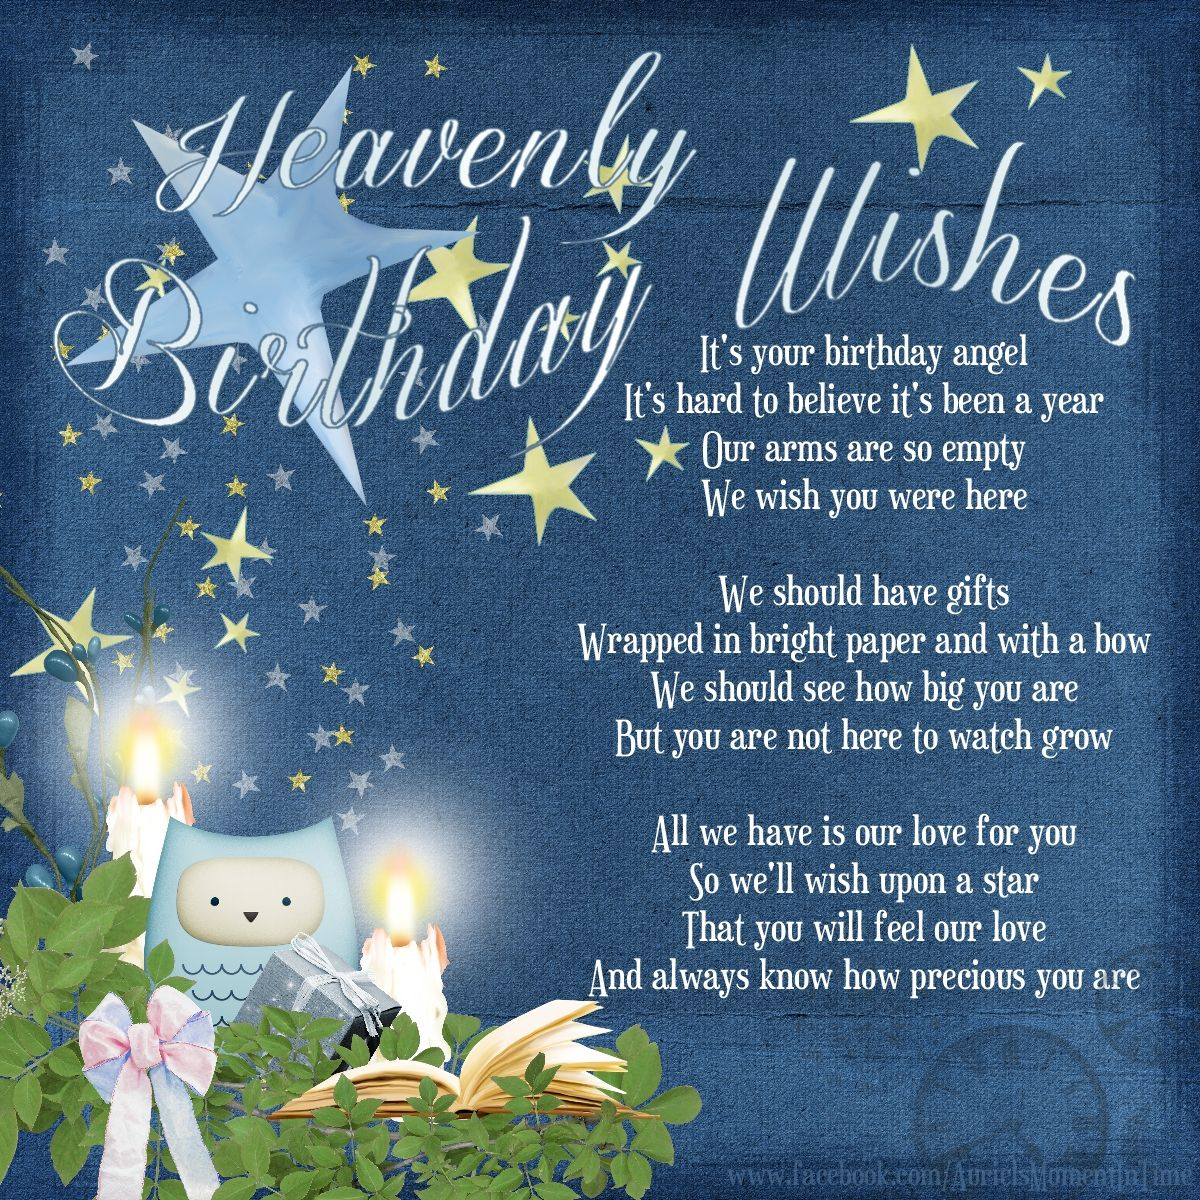 Heavenly Birthday Wishes Birthday in heaven, Birthday in